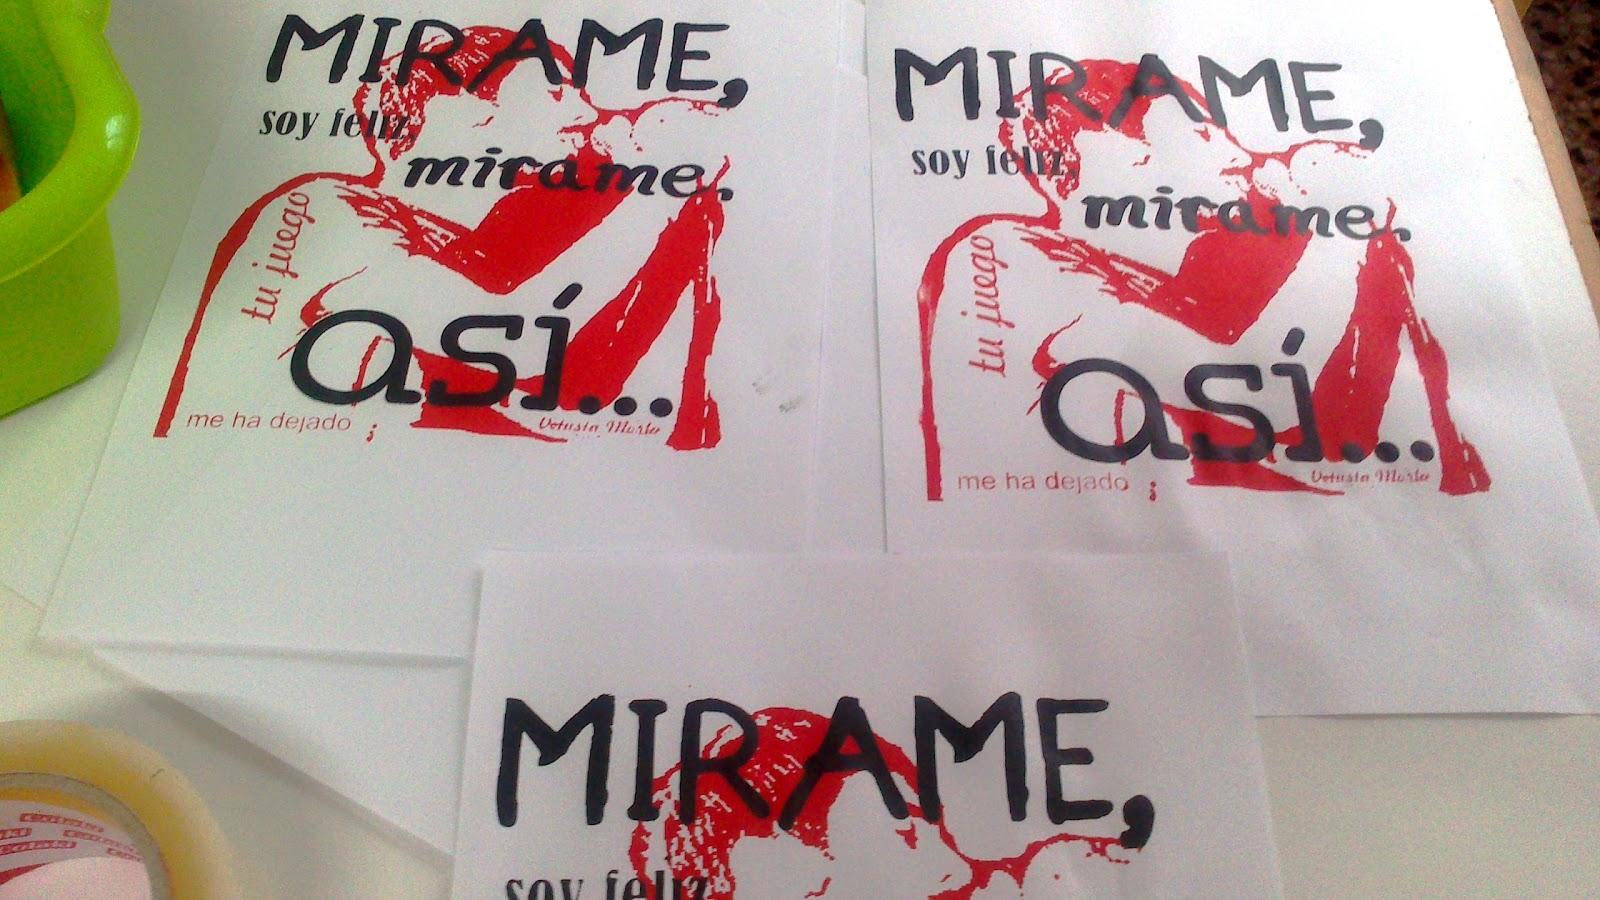 Seriartd2 arte en serigraf a impresi n serigrafia artesana - Letras para serigrafia ...